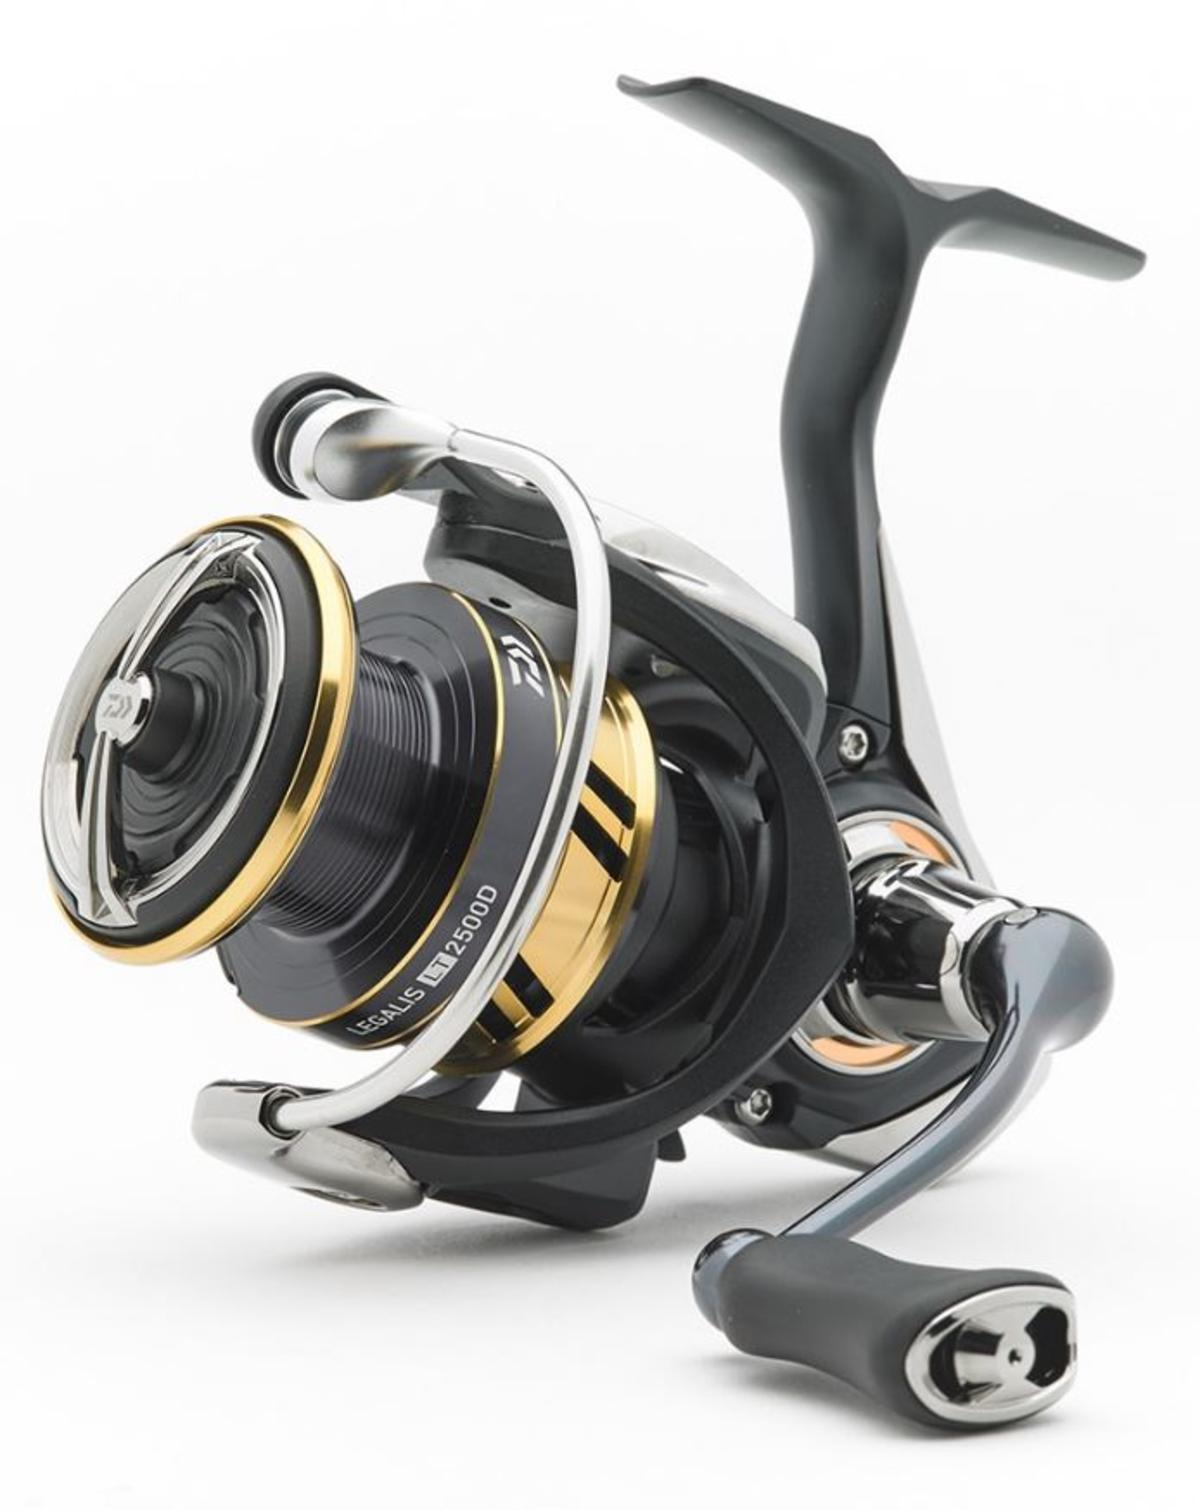 Ex Display Daiwa 17 Legalis LT 5000D-C Fishing Reel 17LEGLT5000D-C